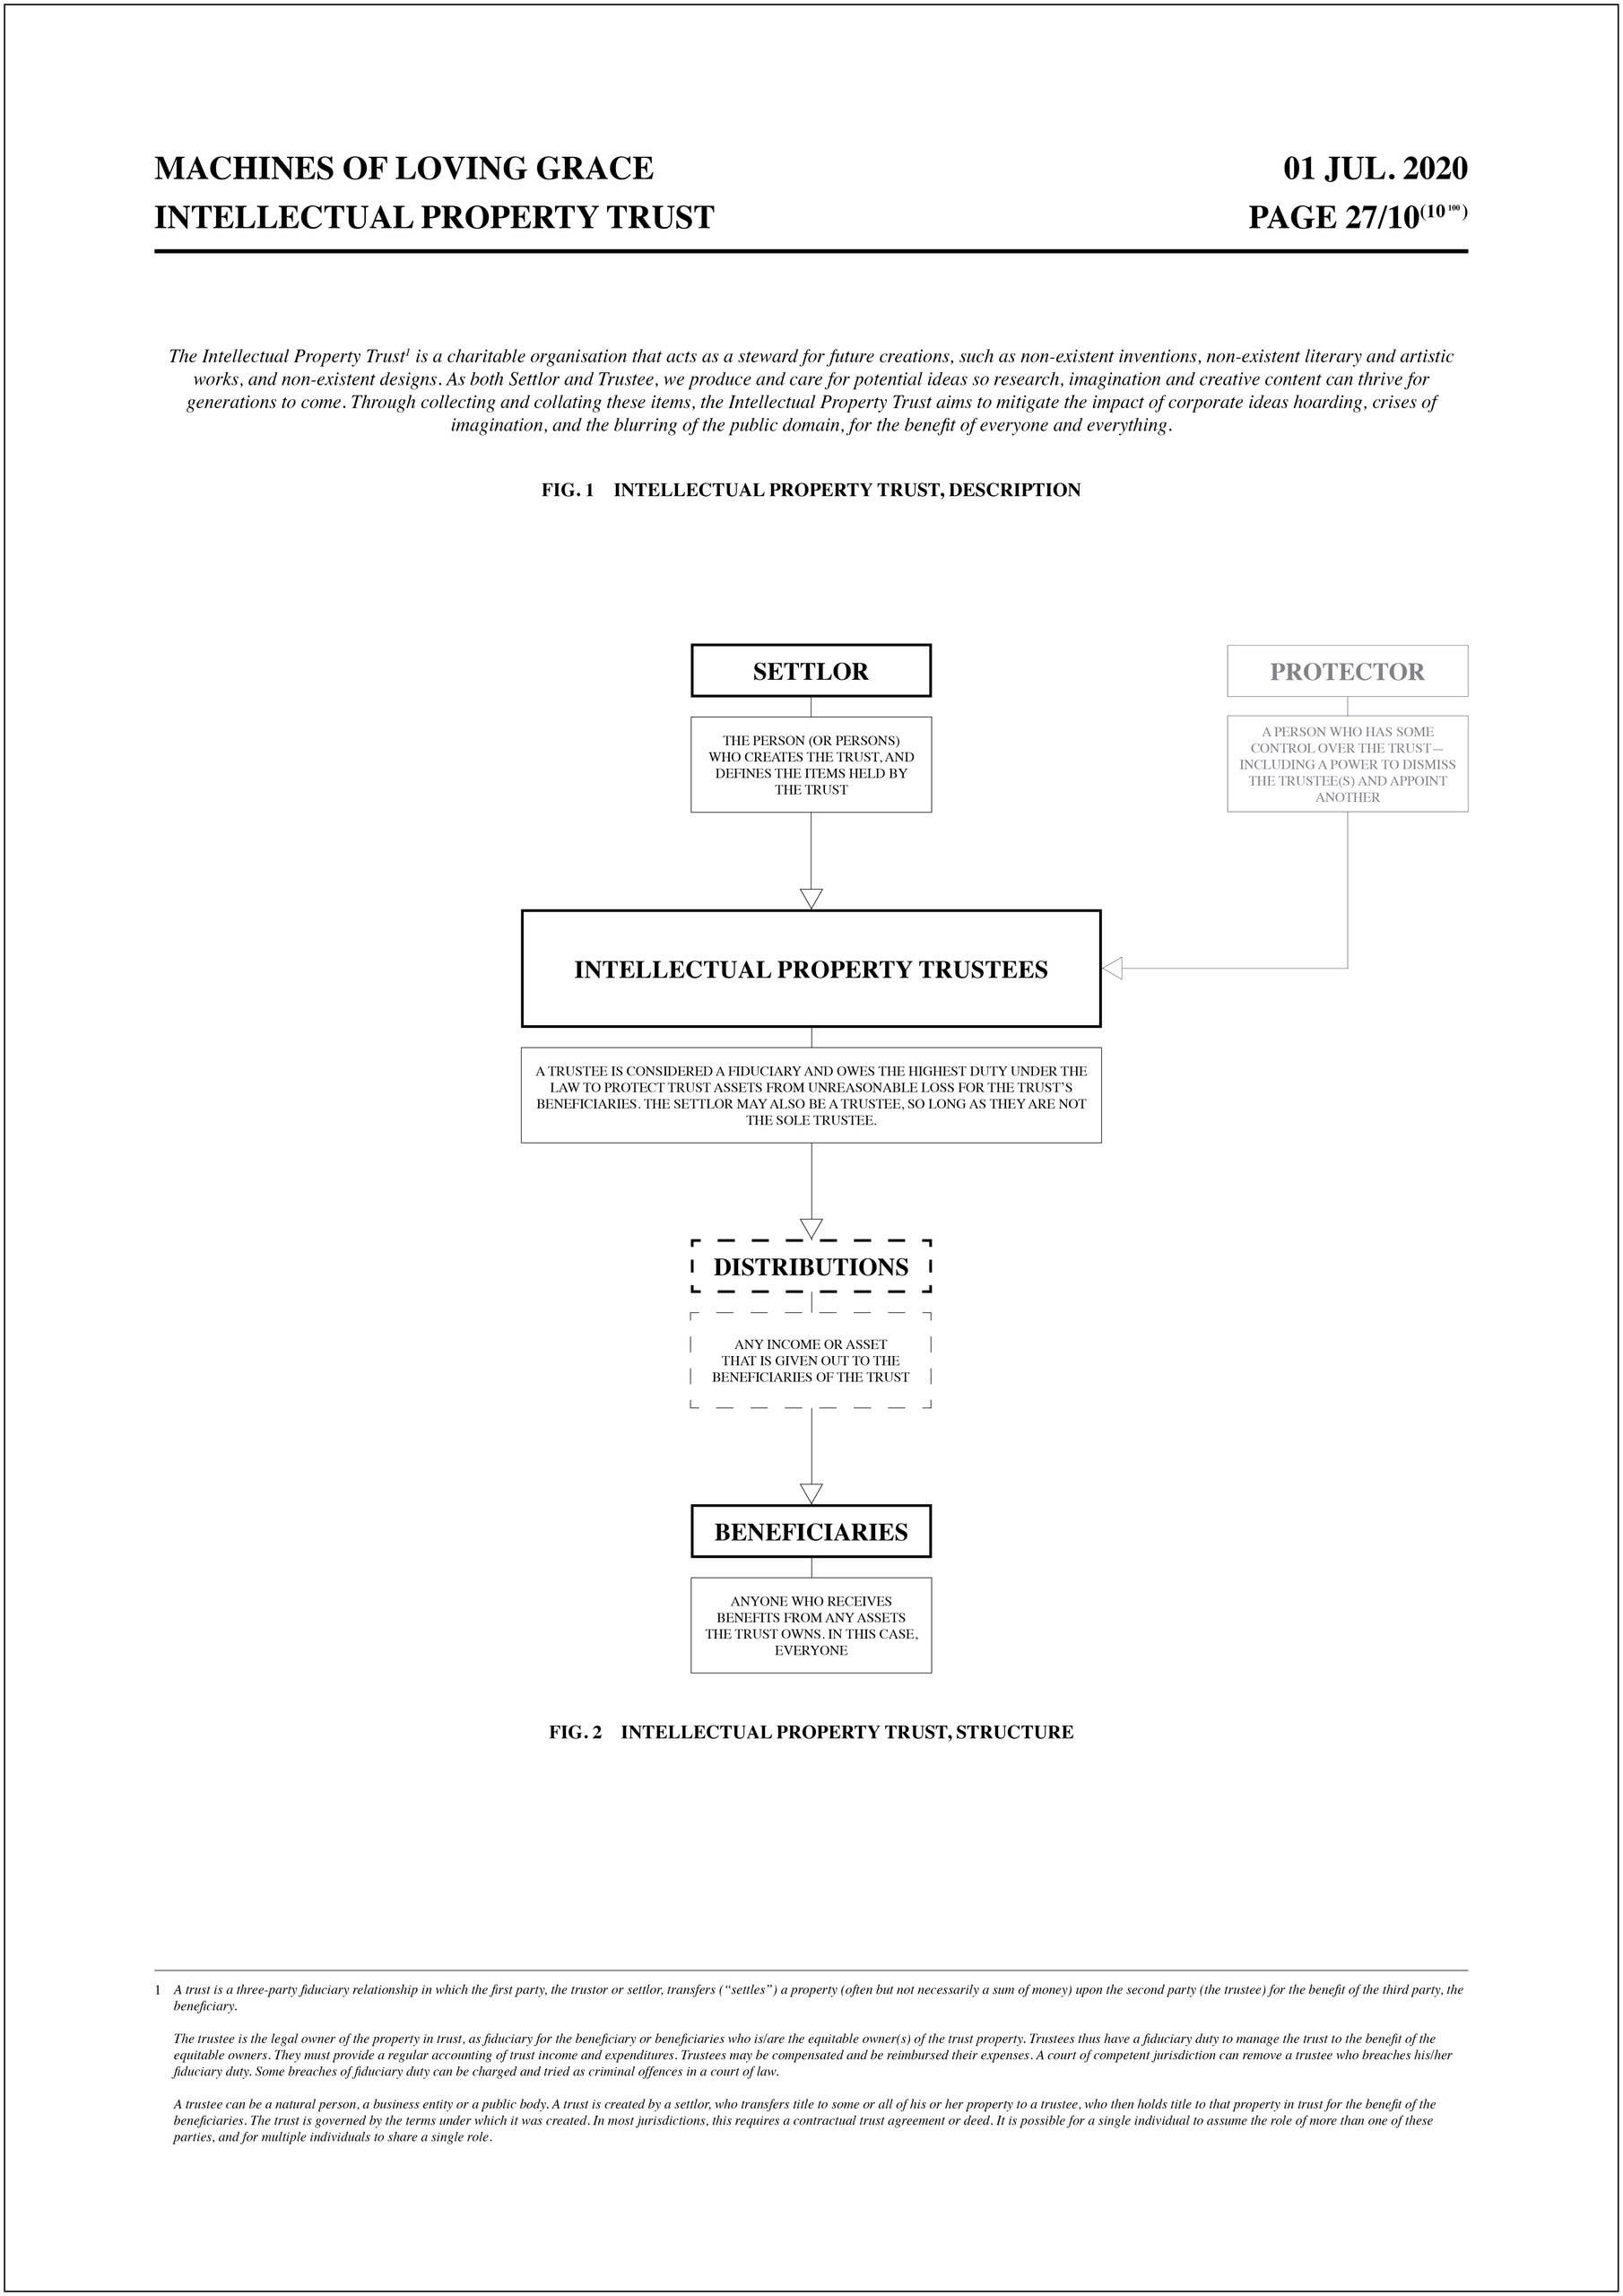 Intellectual Property Trust Organogram